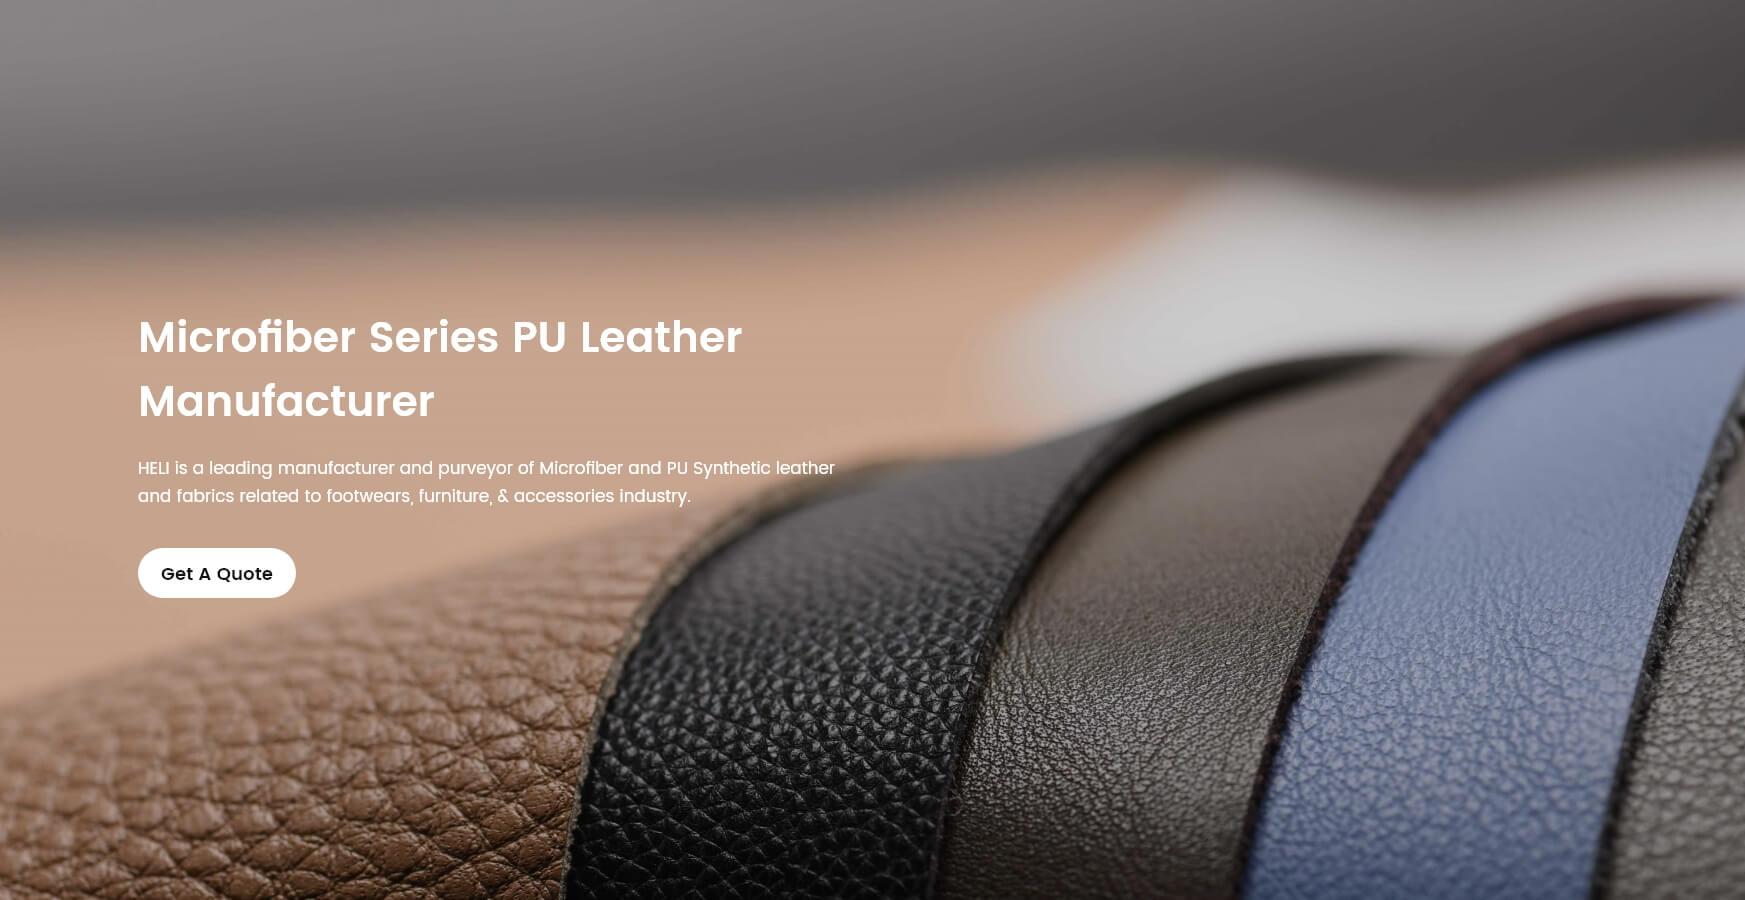 Microfiber Series PU Leather Manufacturer